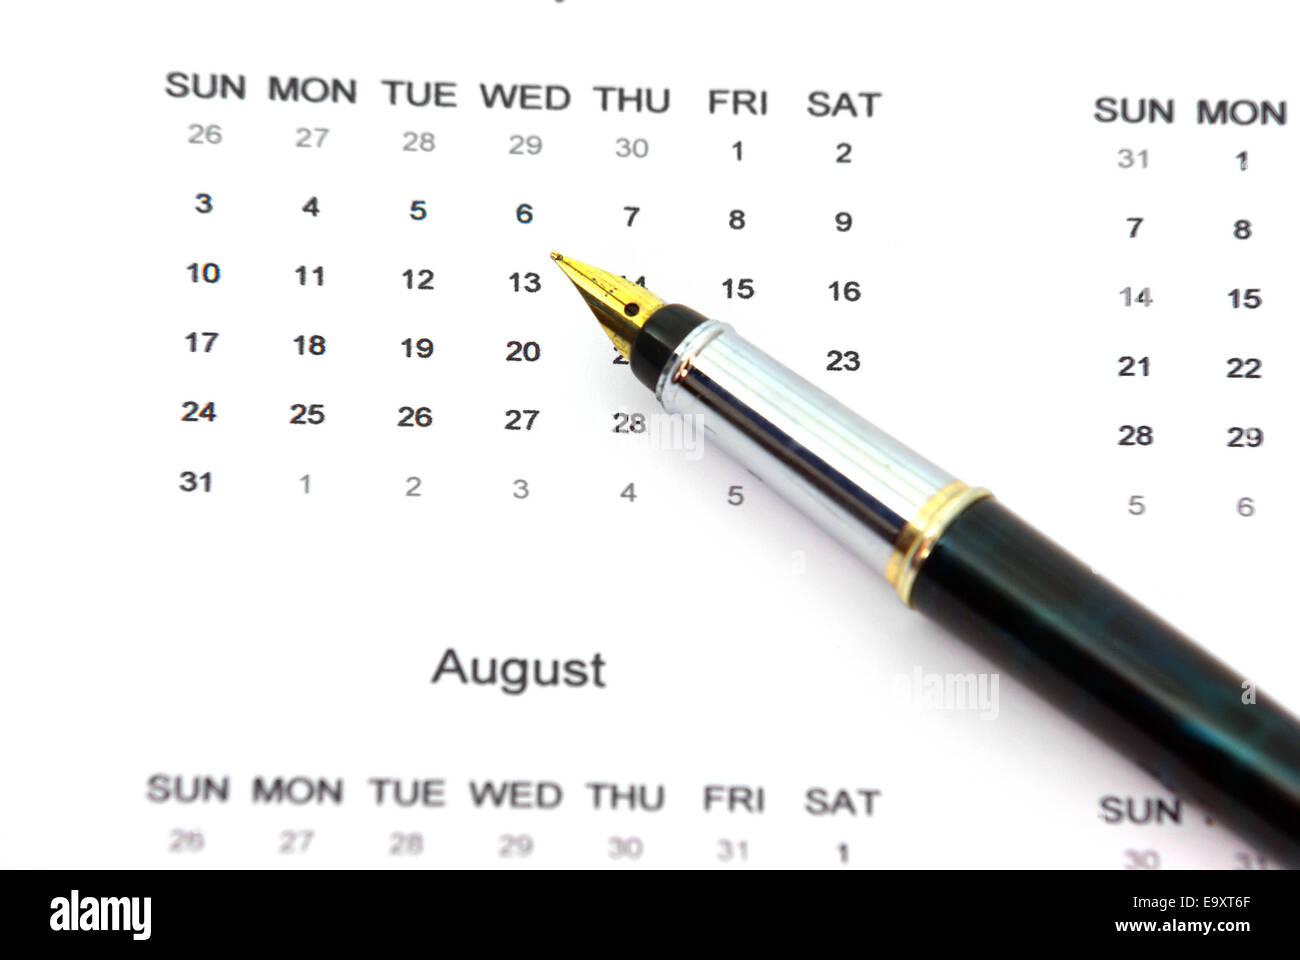 Close up image of a pen on a calendar. - Stock Image